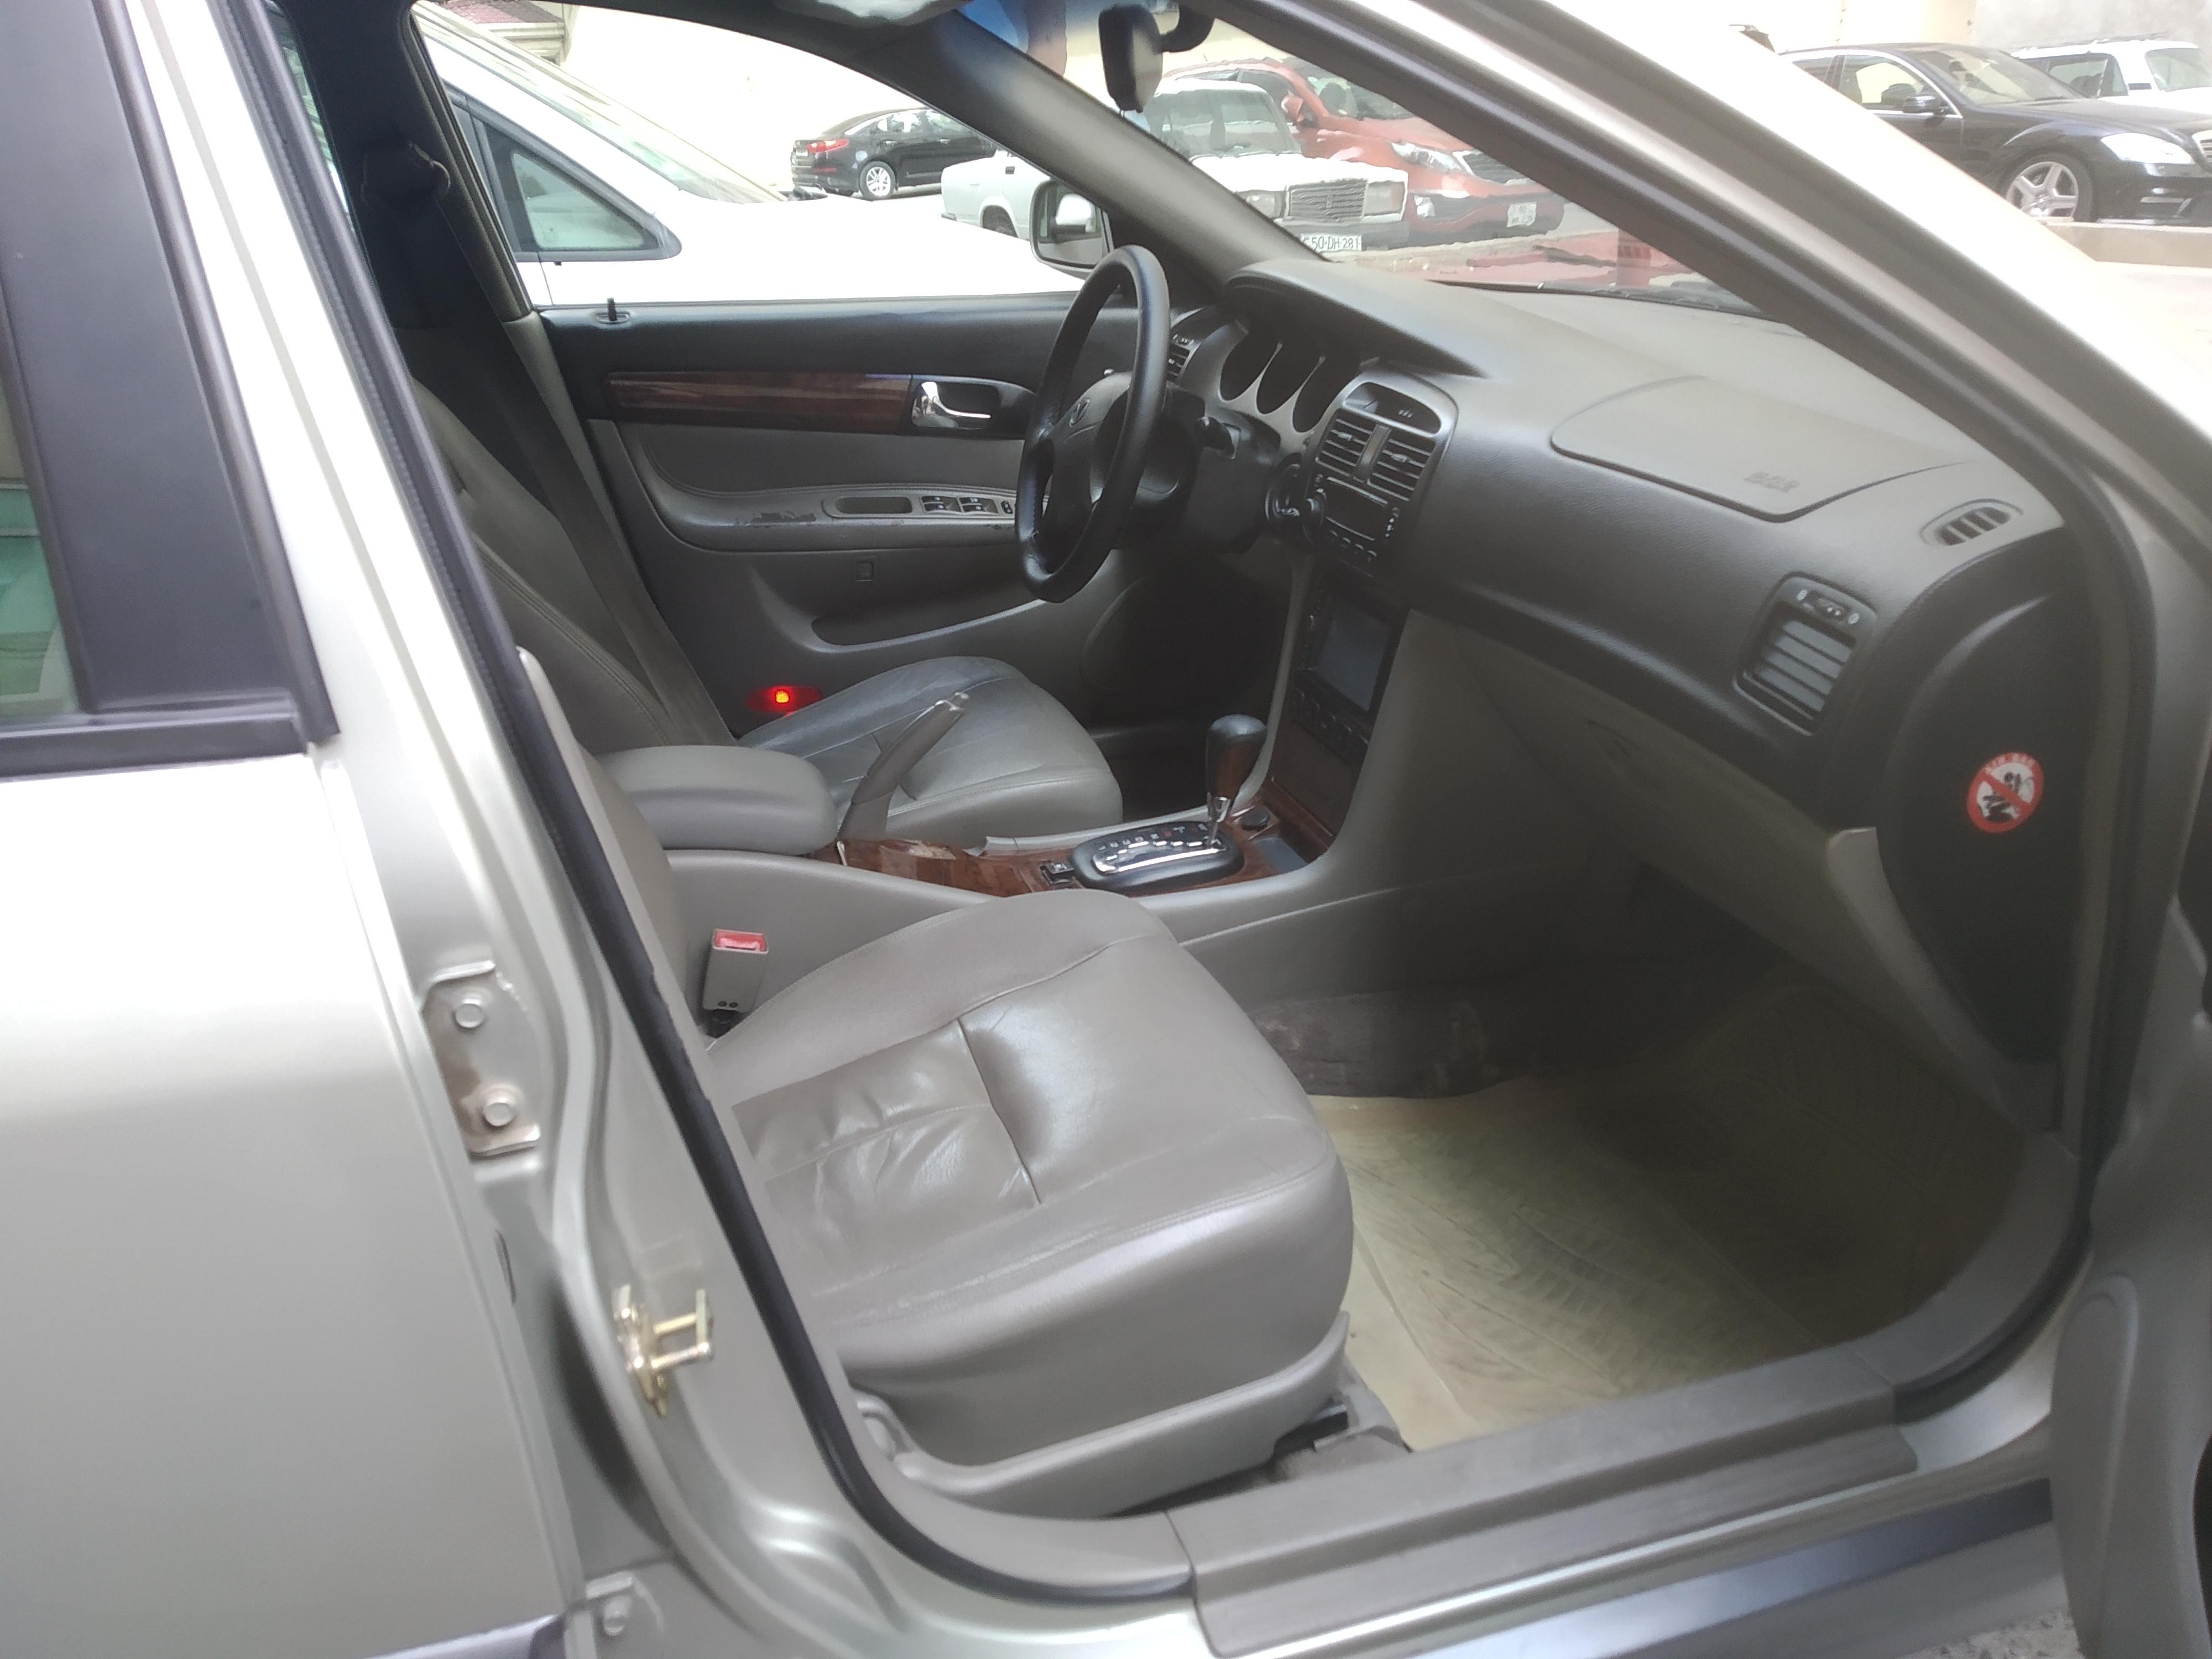 Chevrolet Evanda 2.0(lt) 2004 İkinci əl  $4500